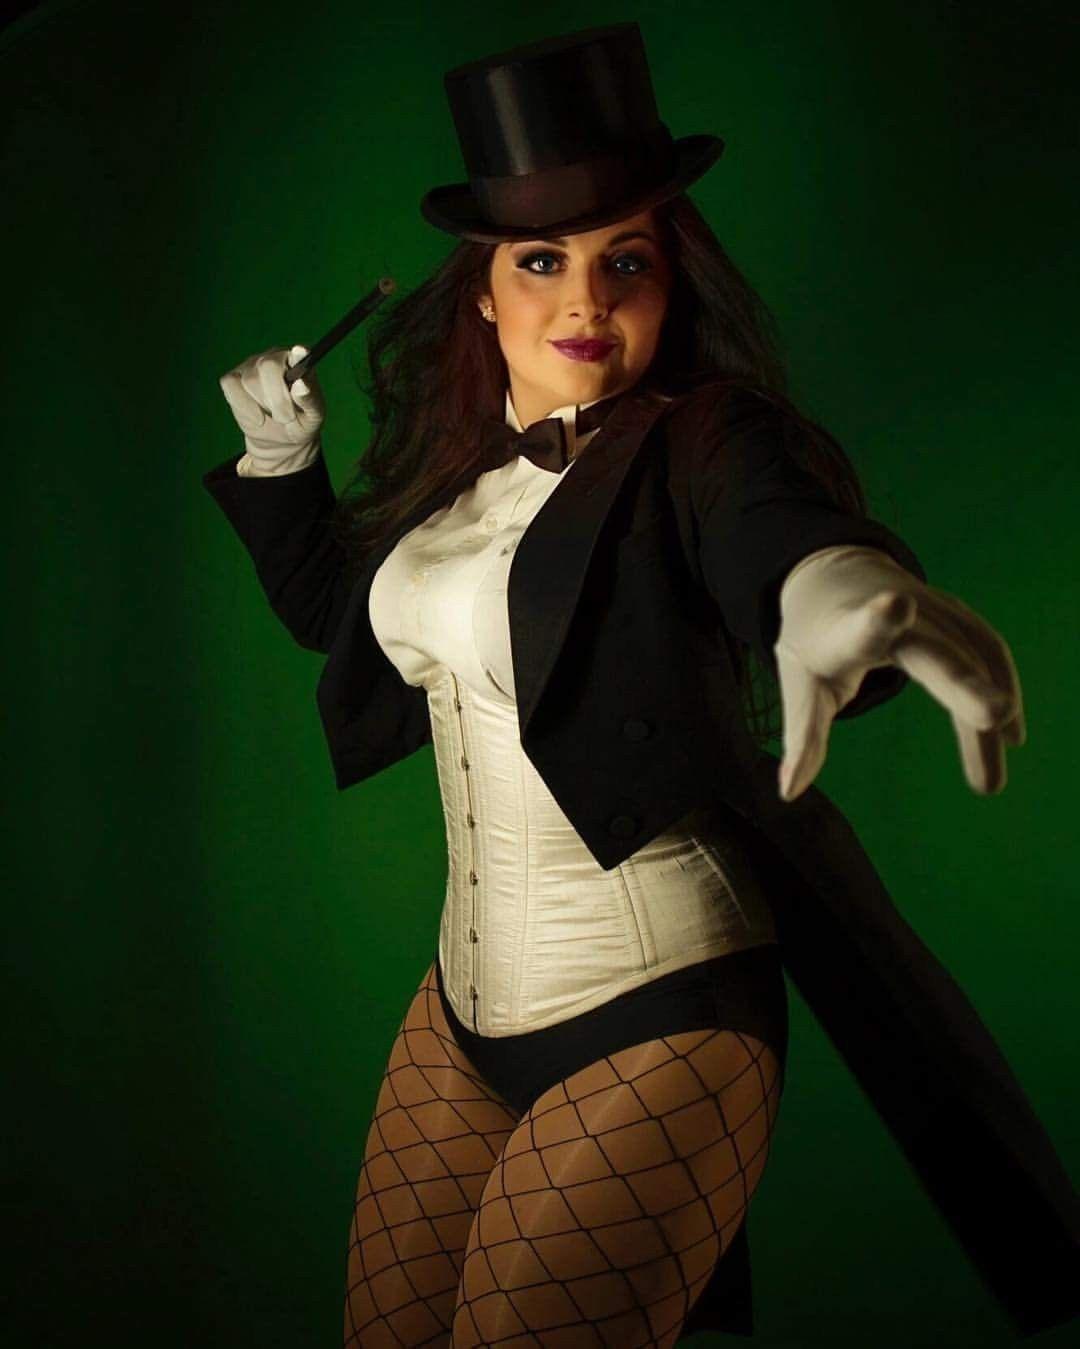 Zatanna Zatara (DC) #cosplay   Cosplay outfits, Zatanna